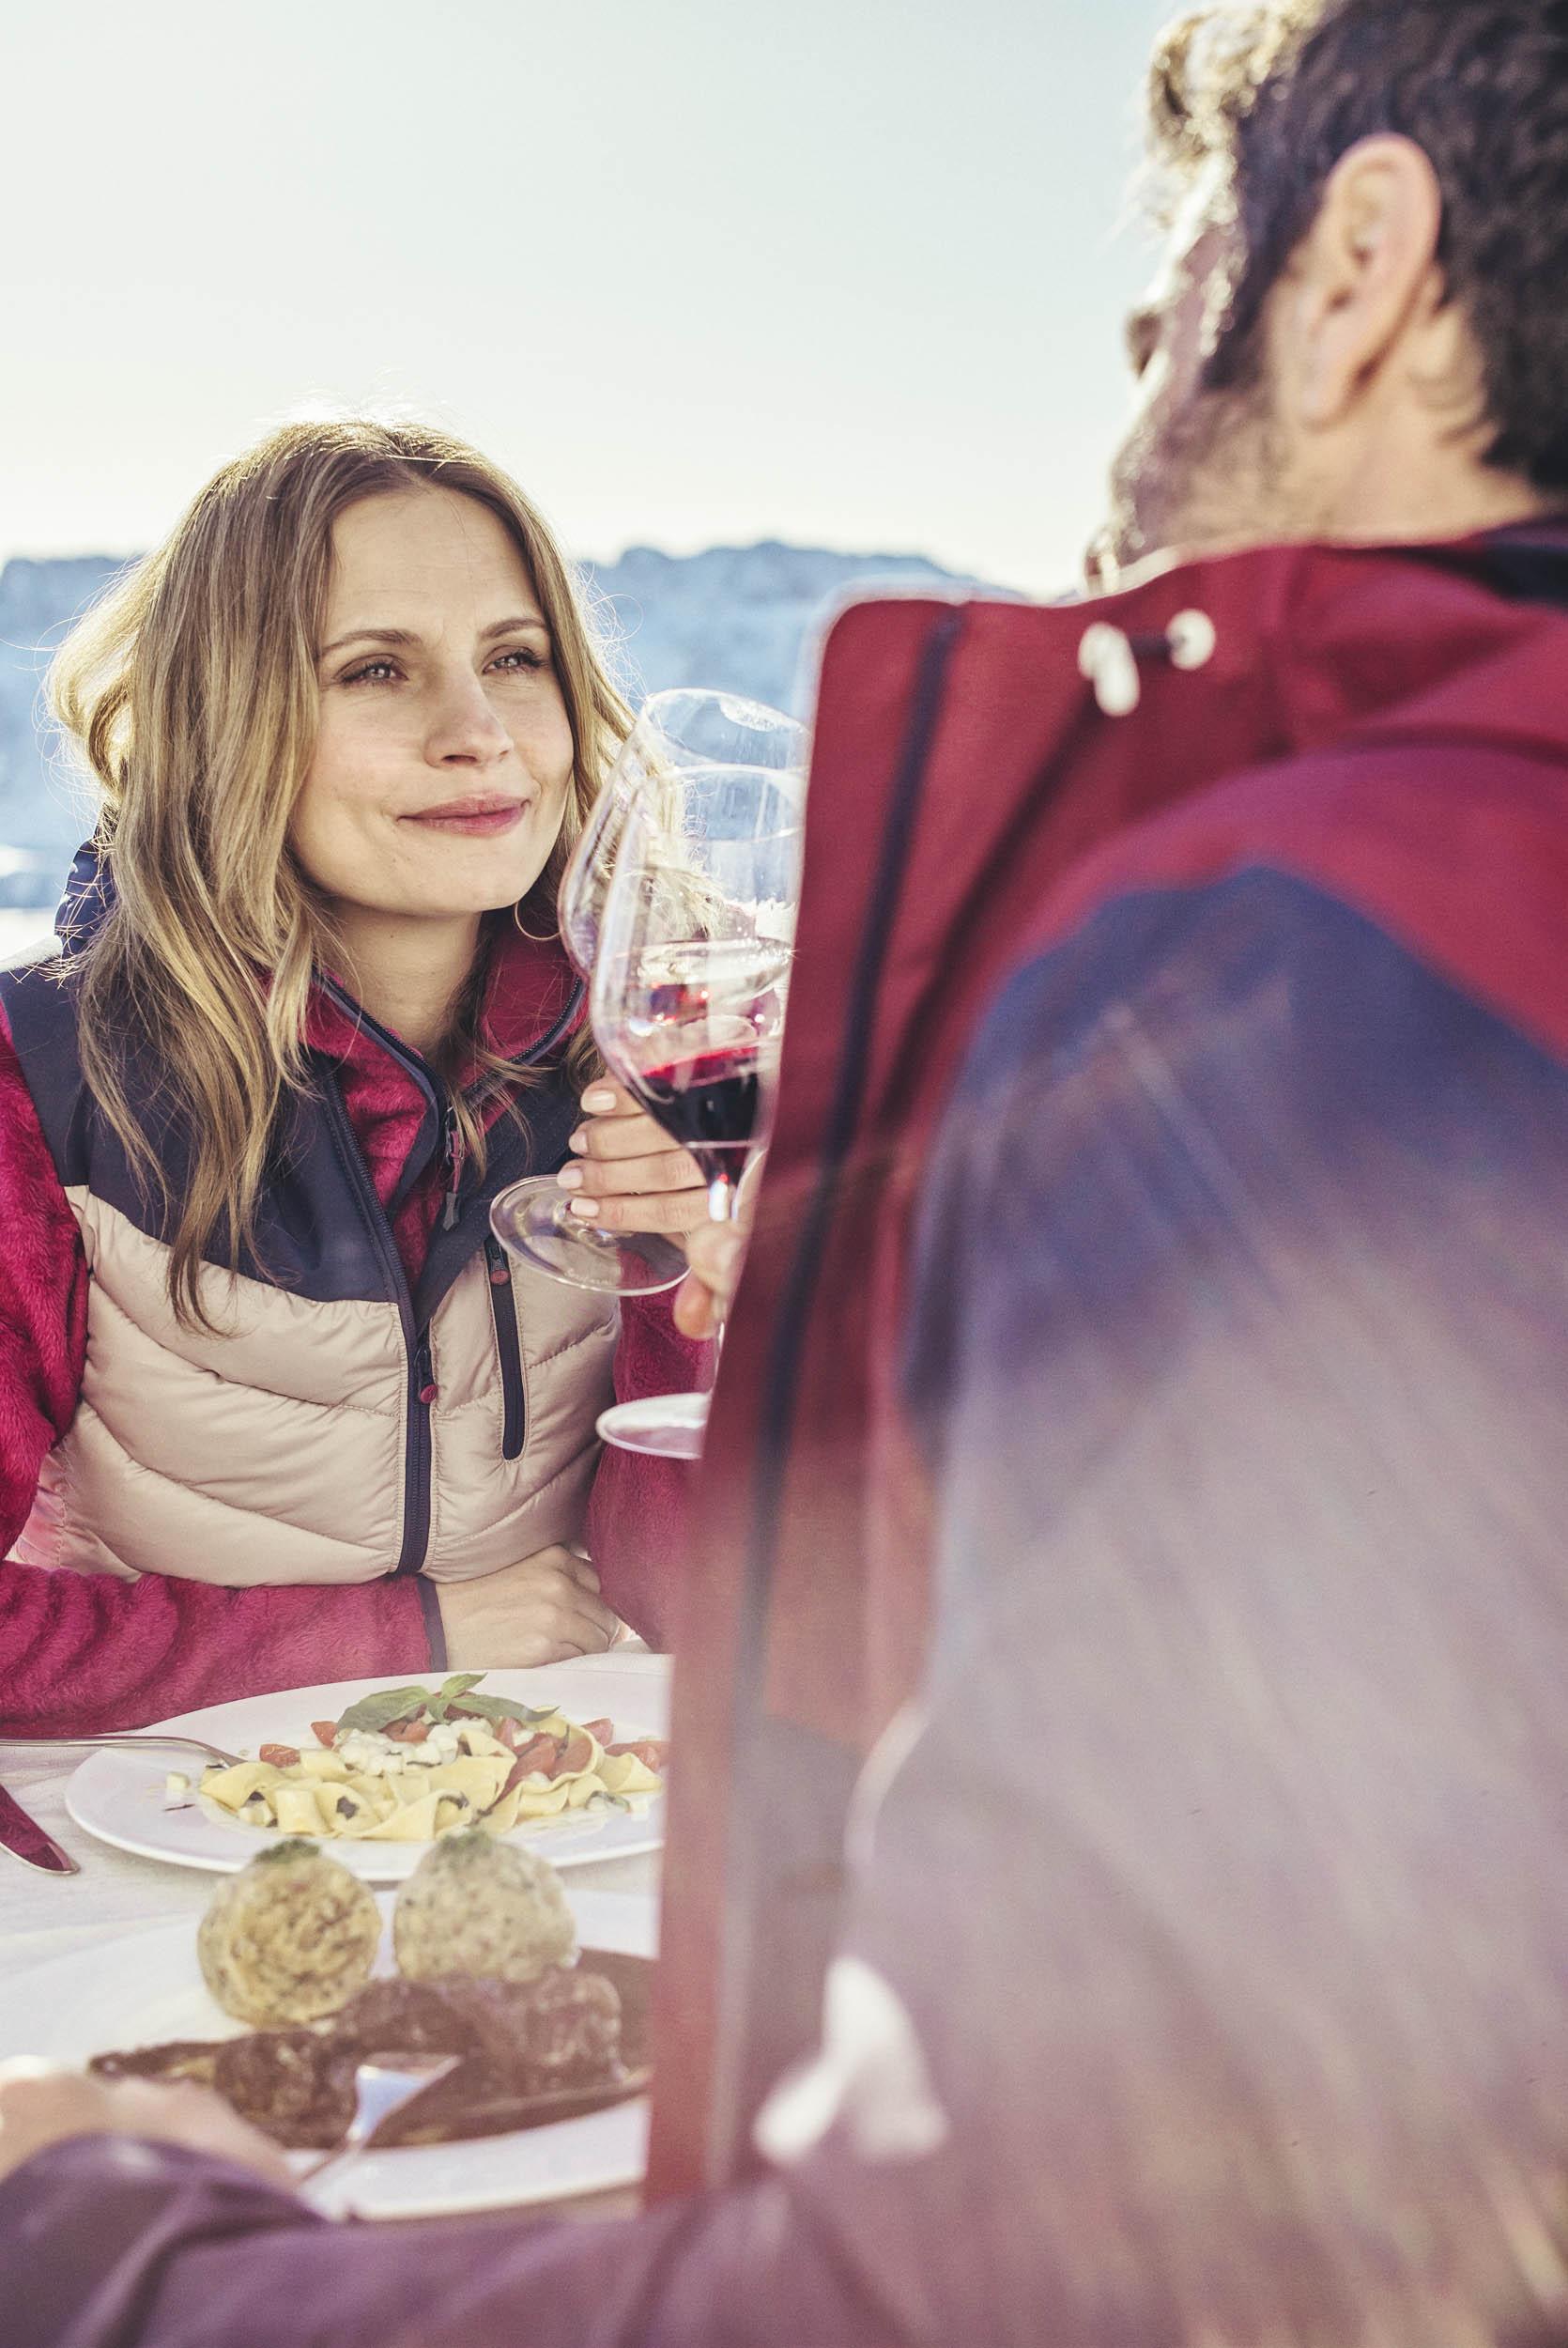 seifertuebler-lifestyle-suedtirol-winter-tourism-ski-dolomites08.jpg